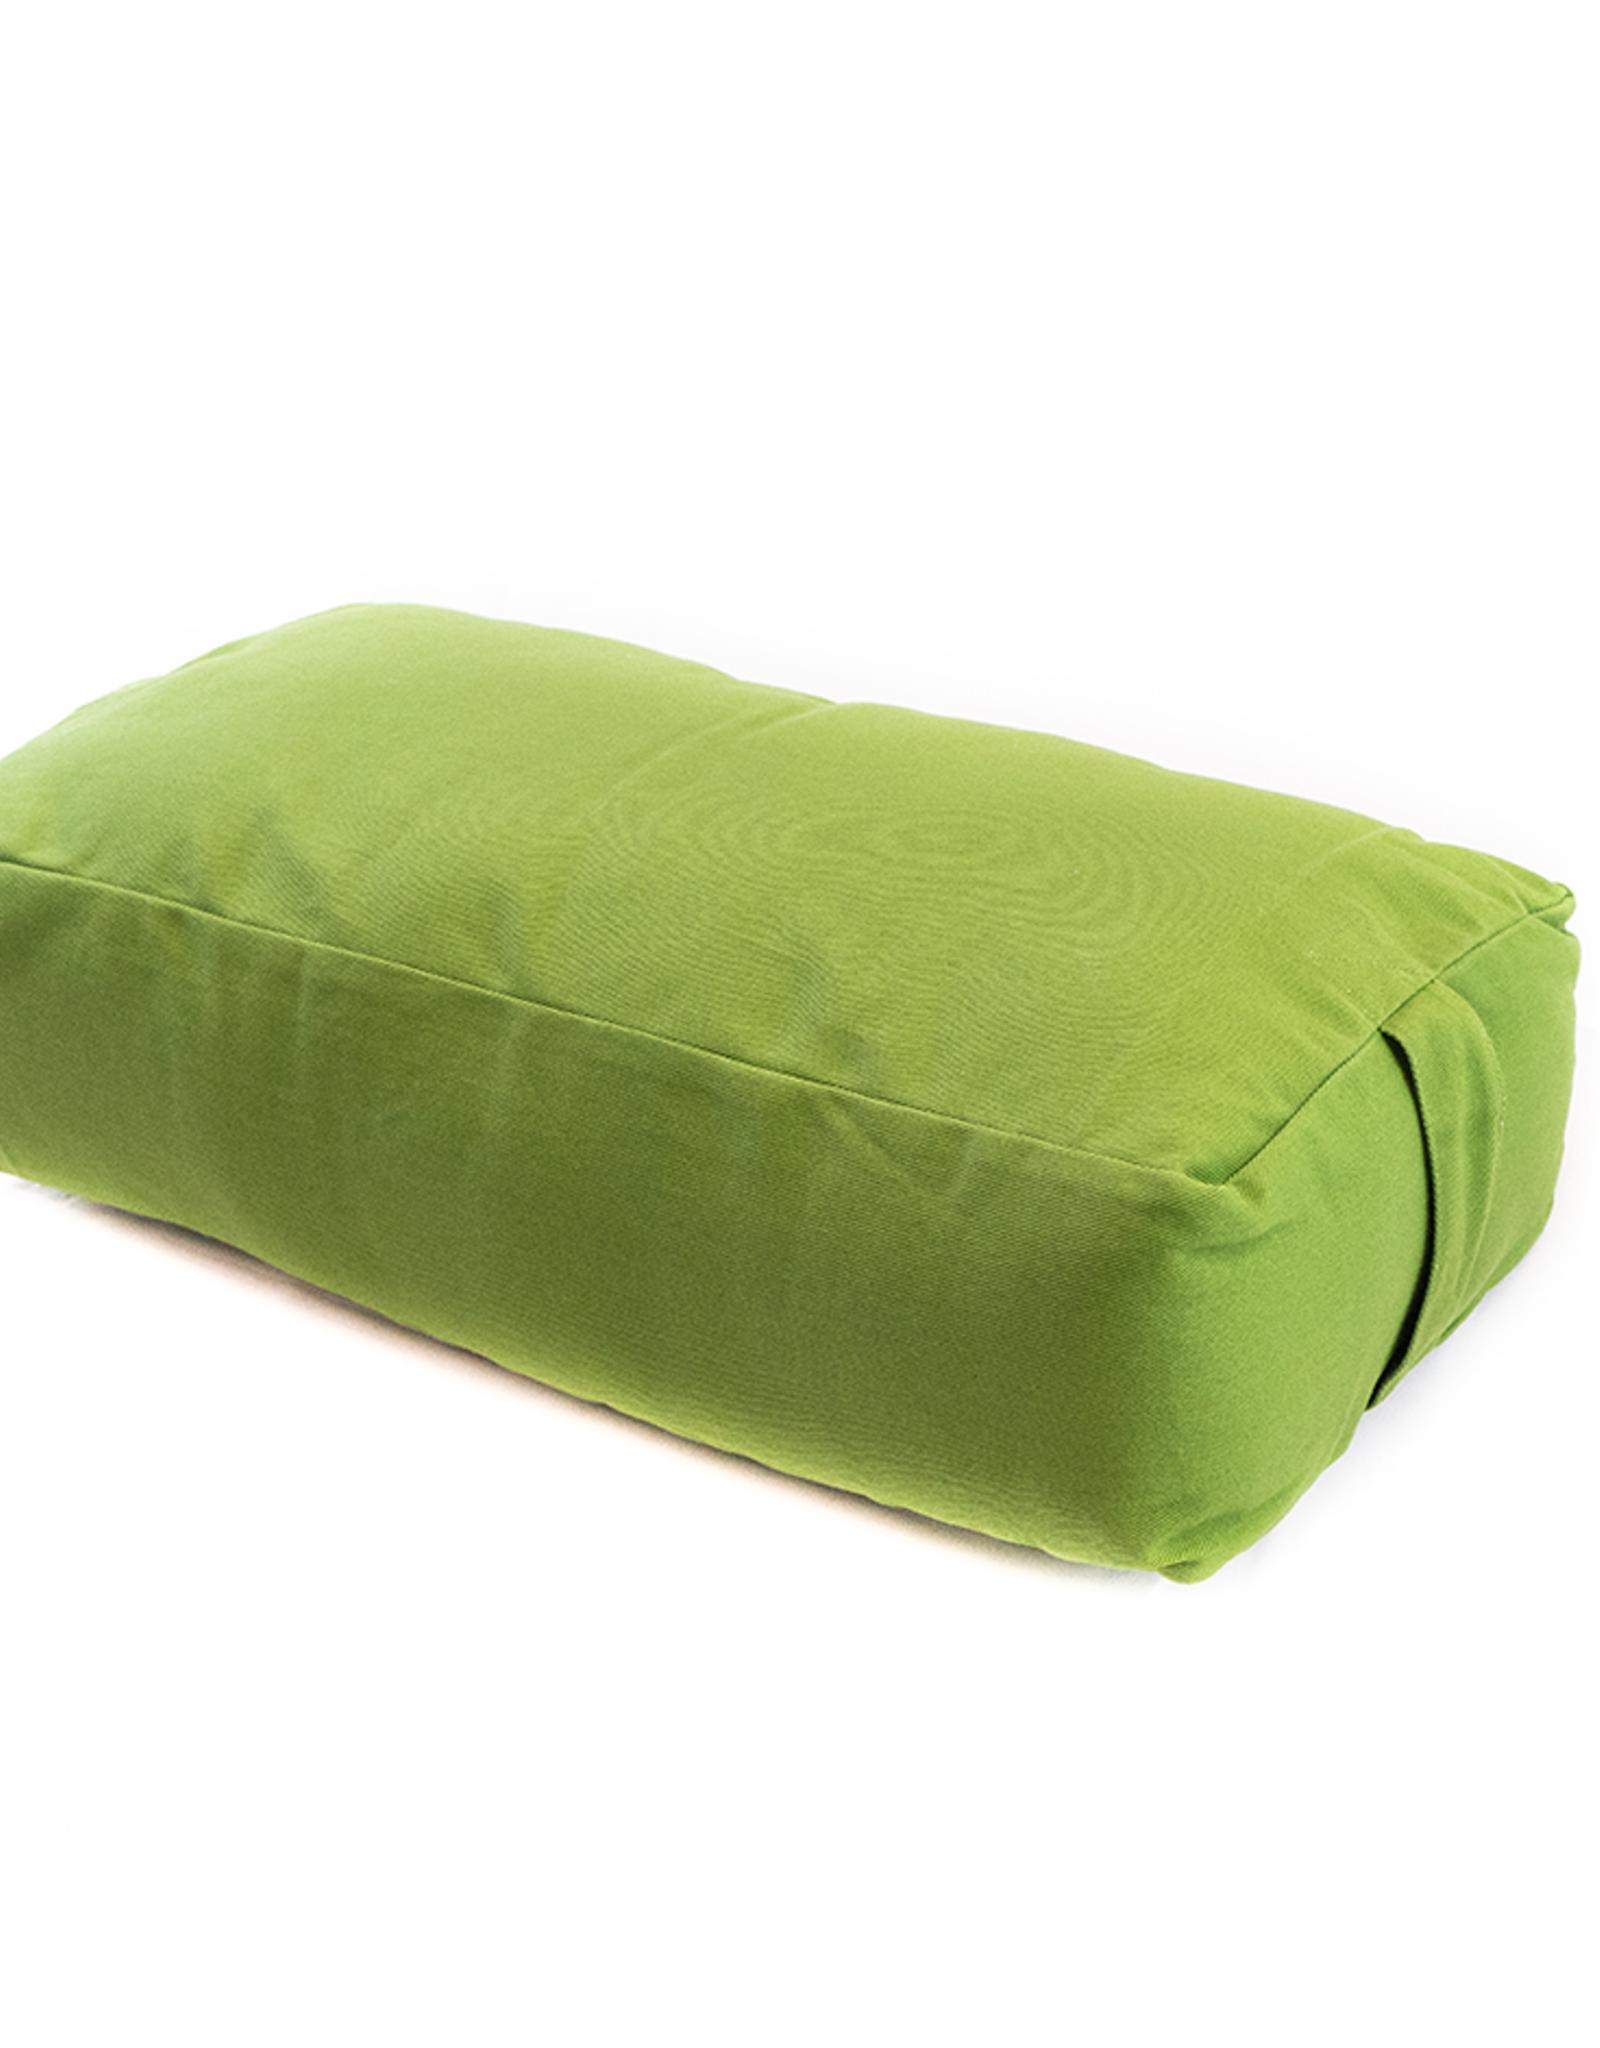 Yoga Accessories Rectangular Cotton Bolster - Olive Green